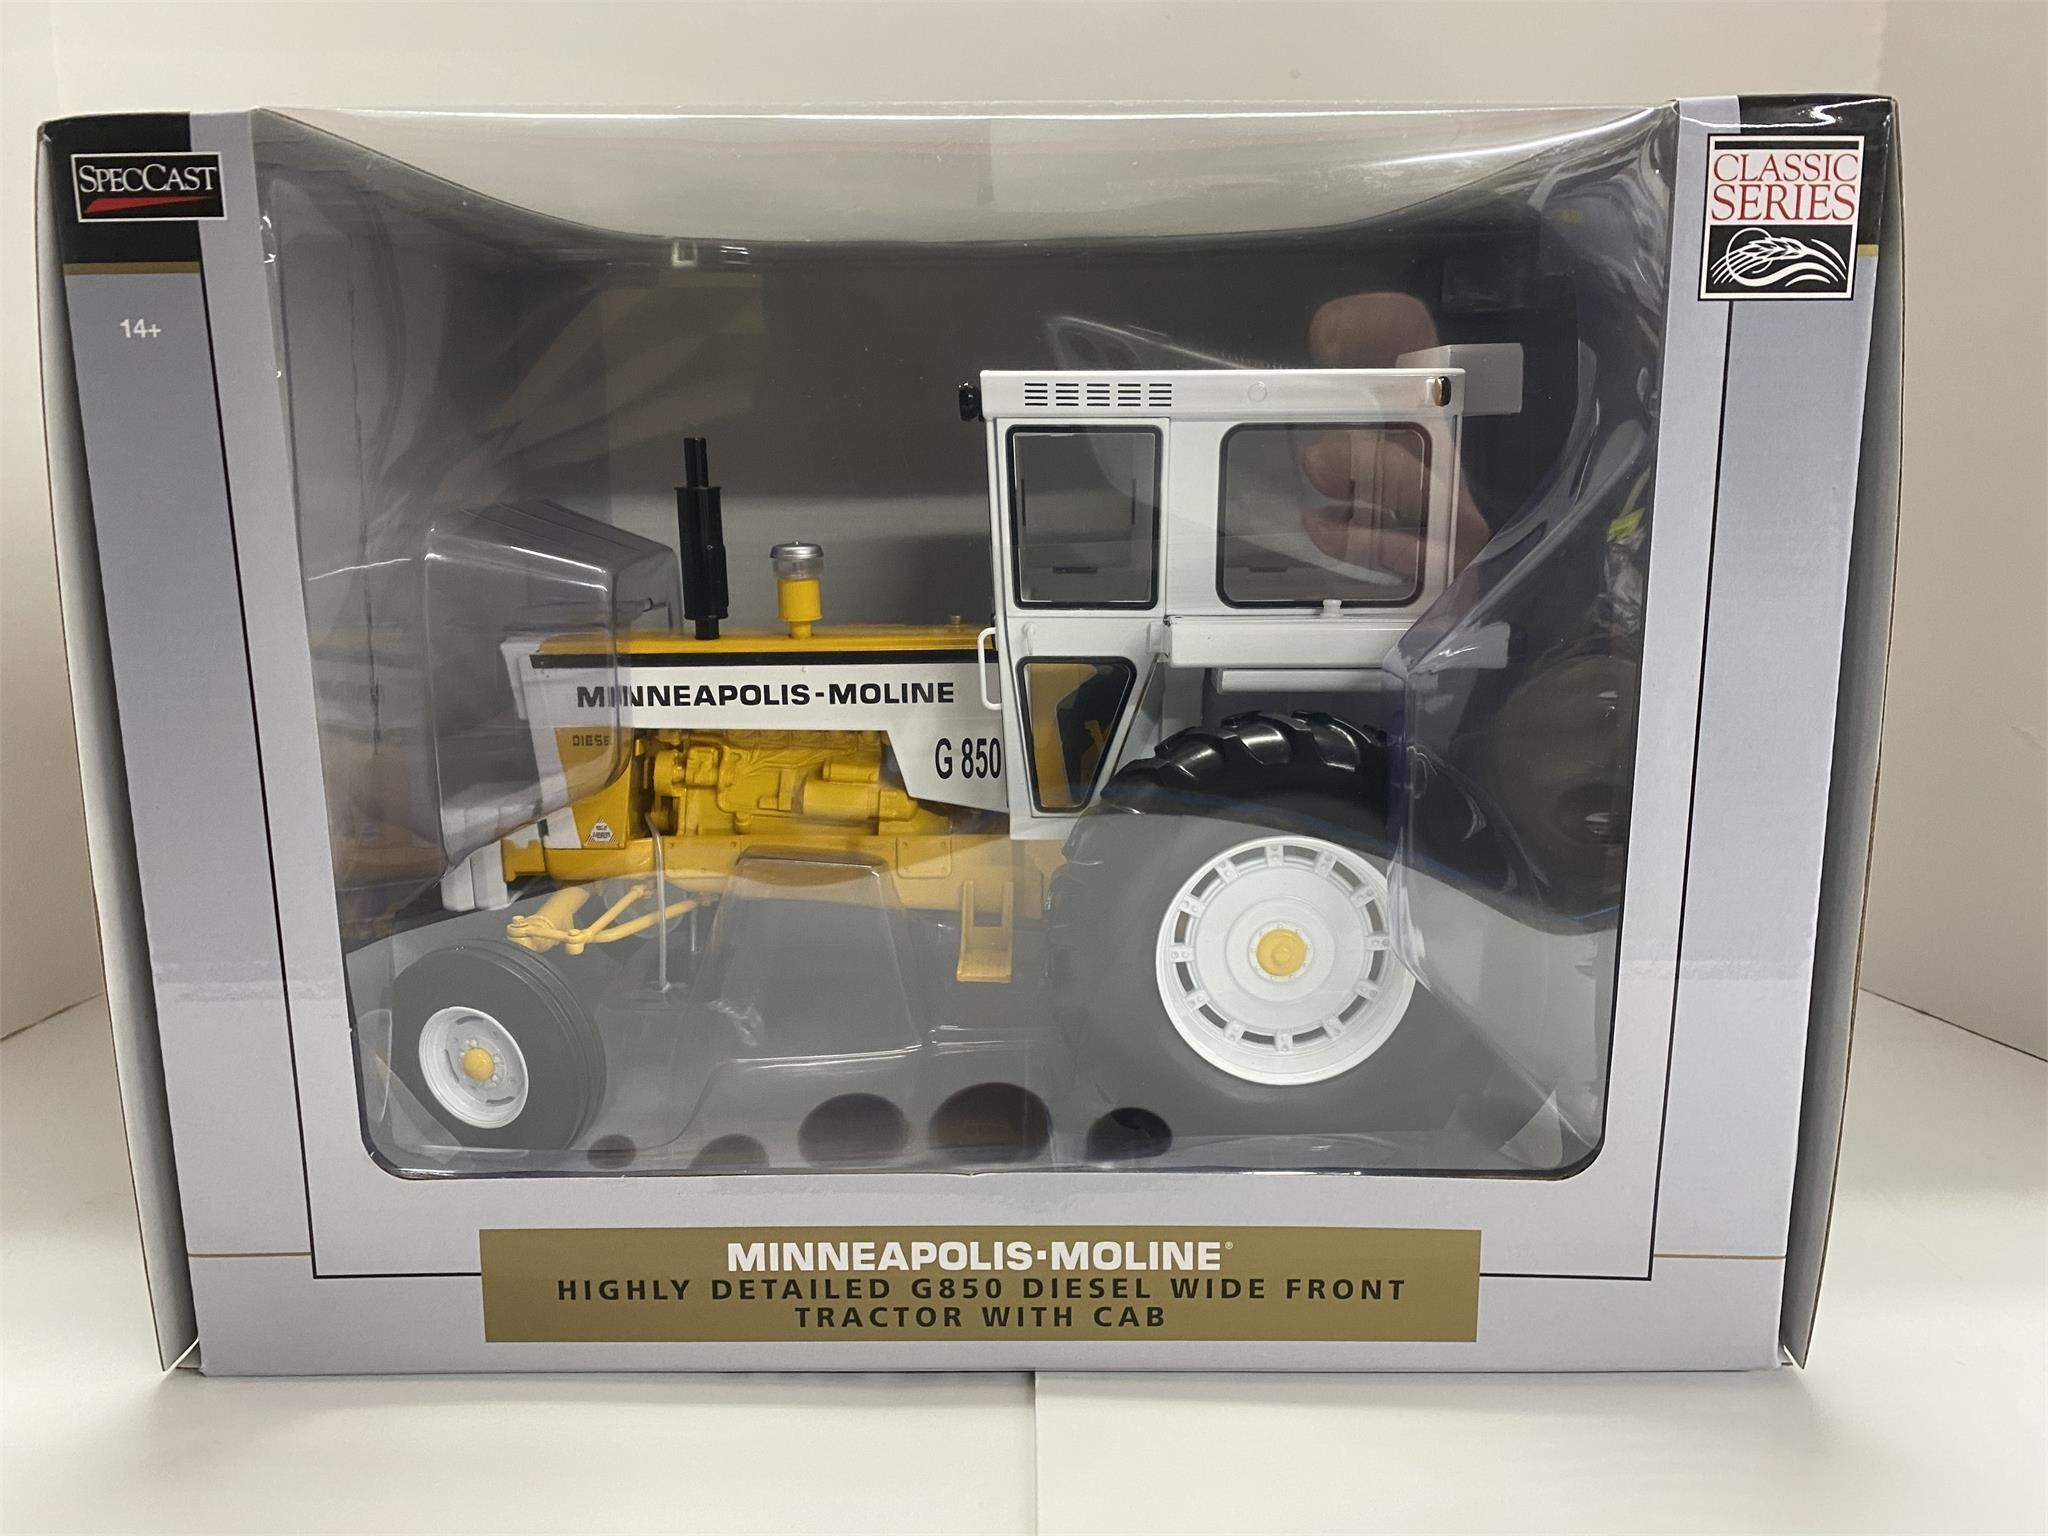 Minneapolis-Moline G850 Tractor